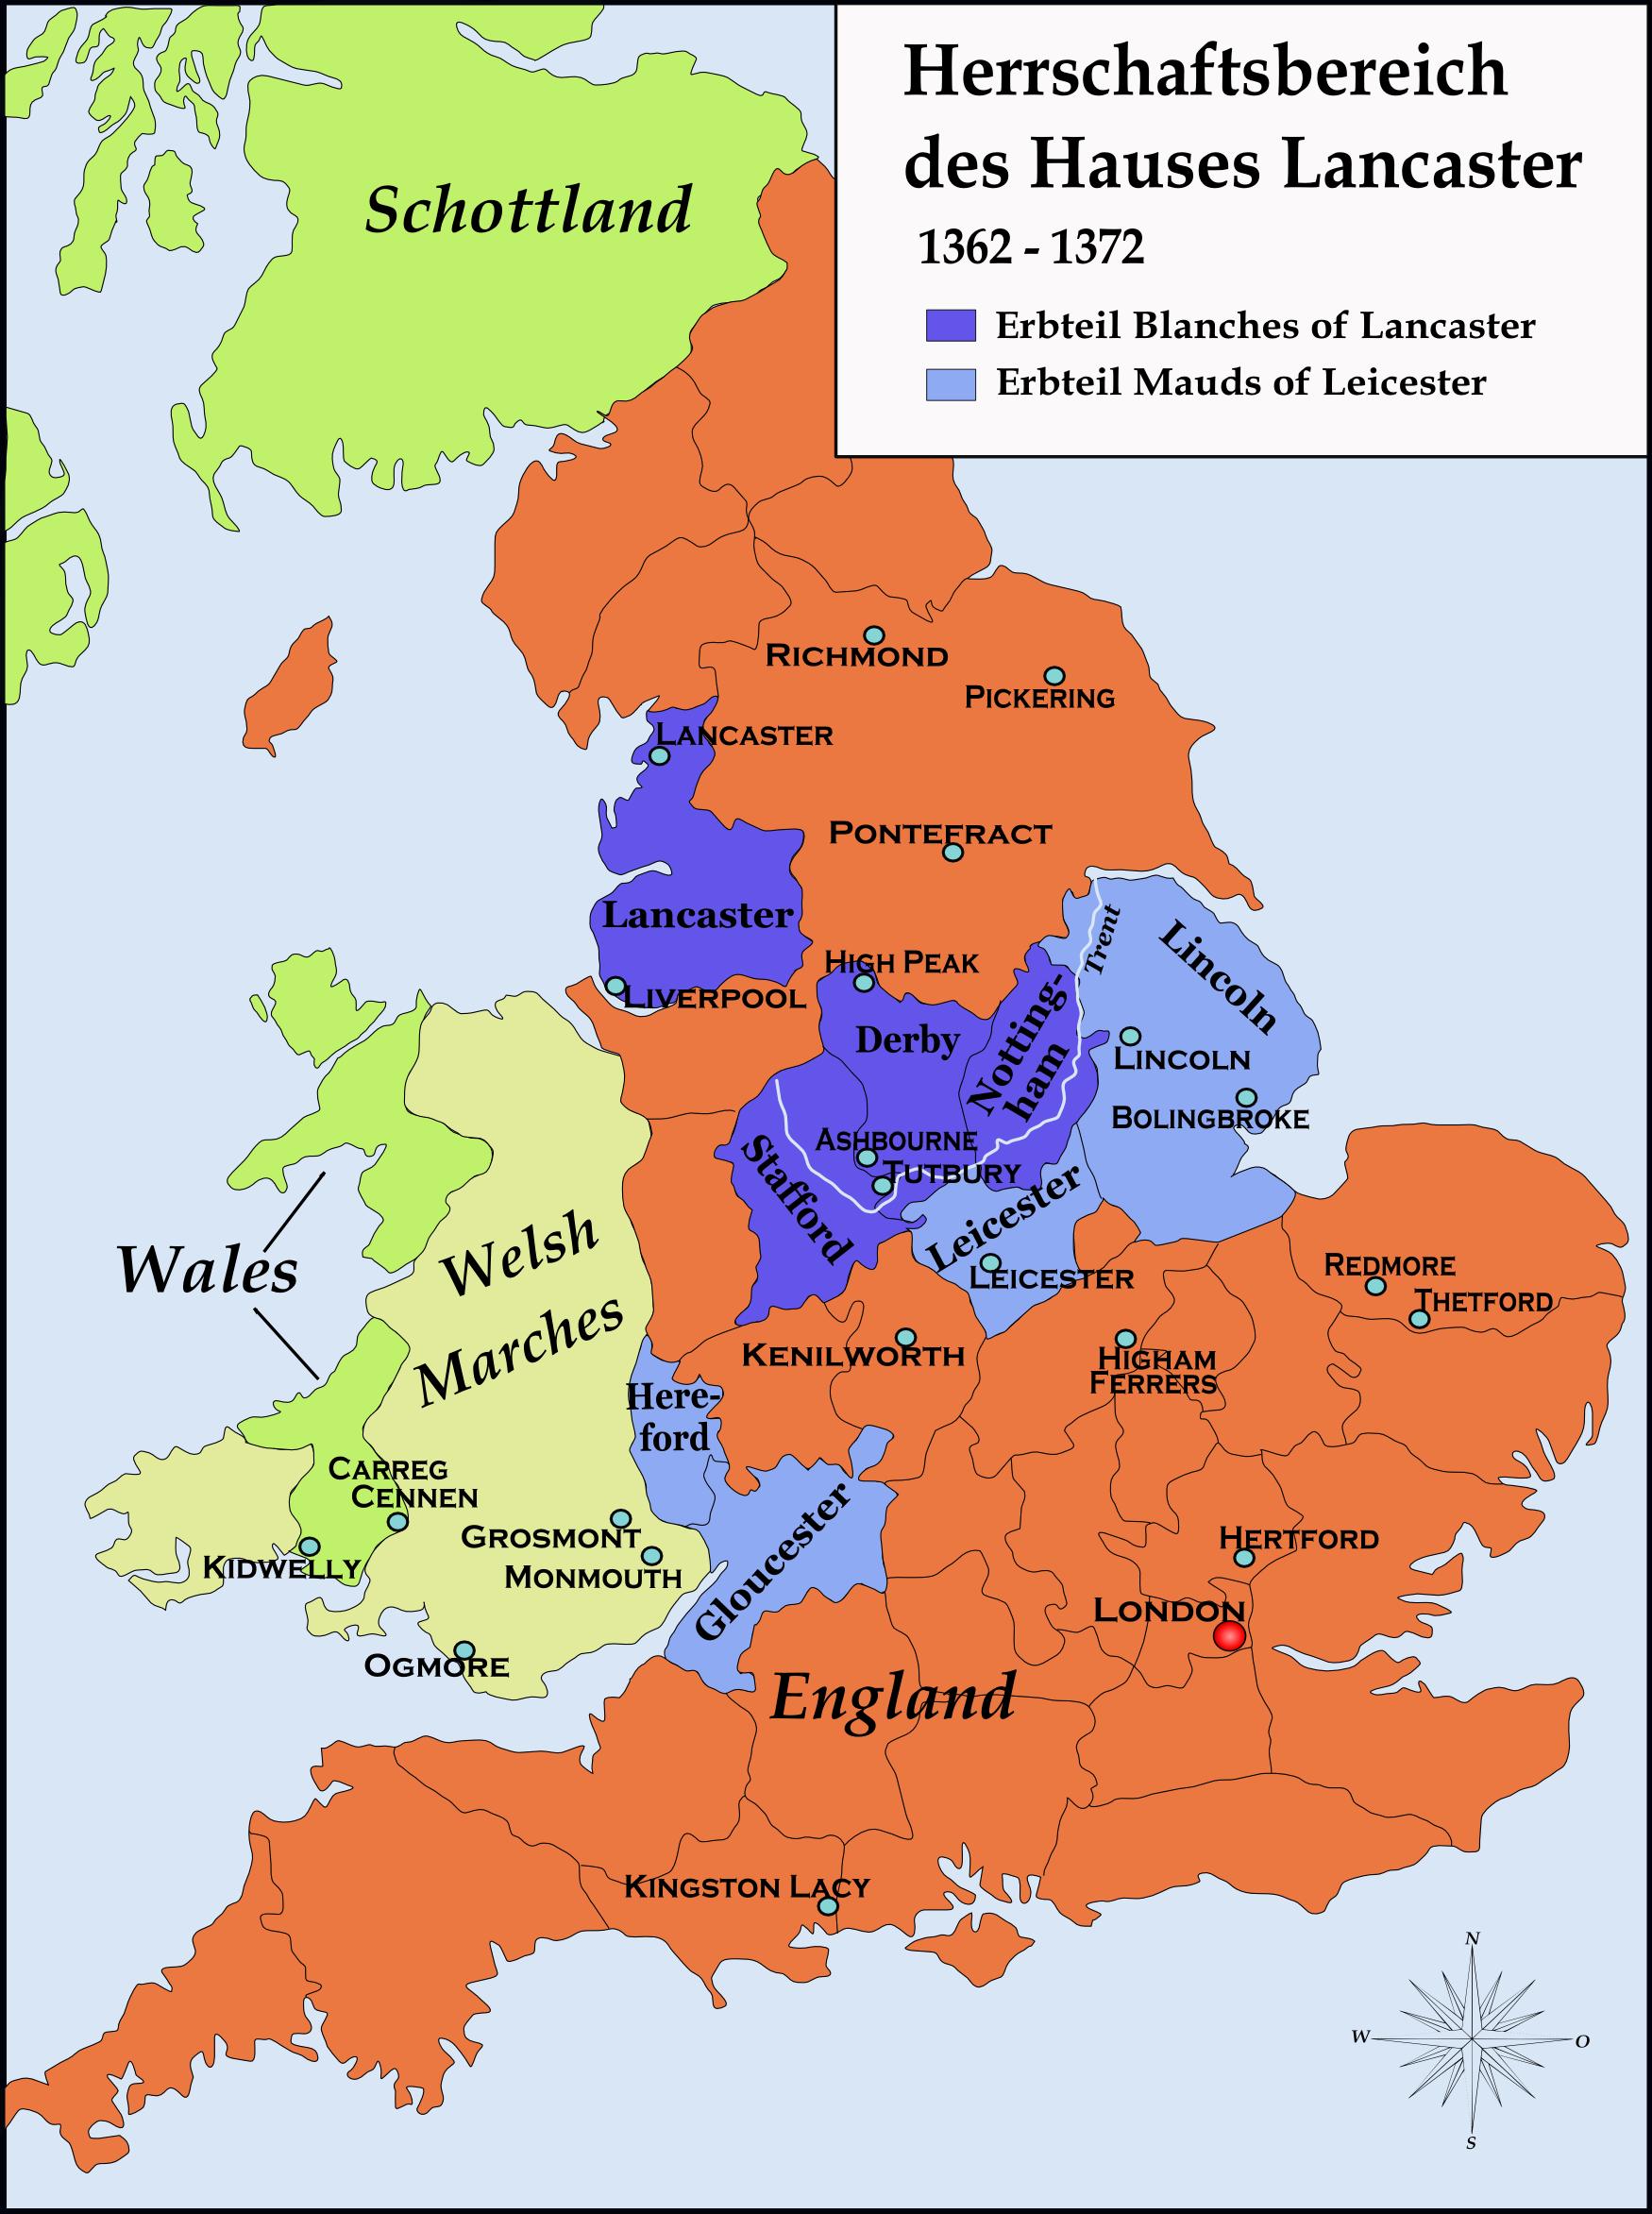 file houselancaster1362 map wikimedia mons